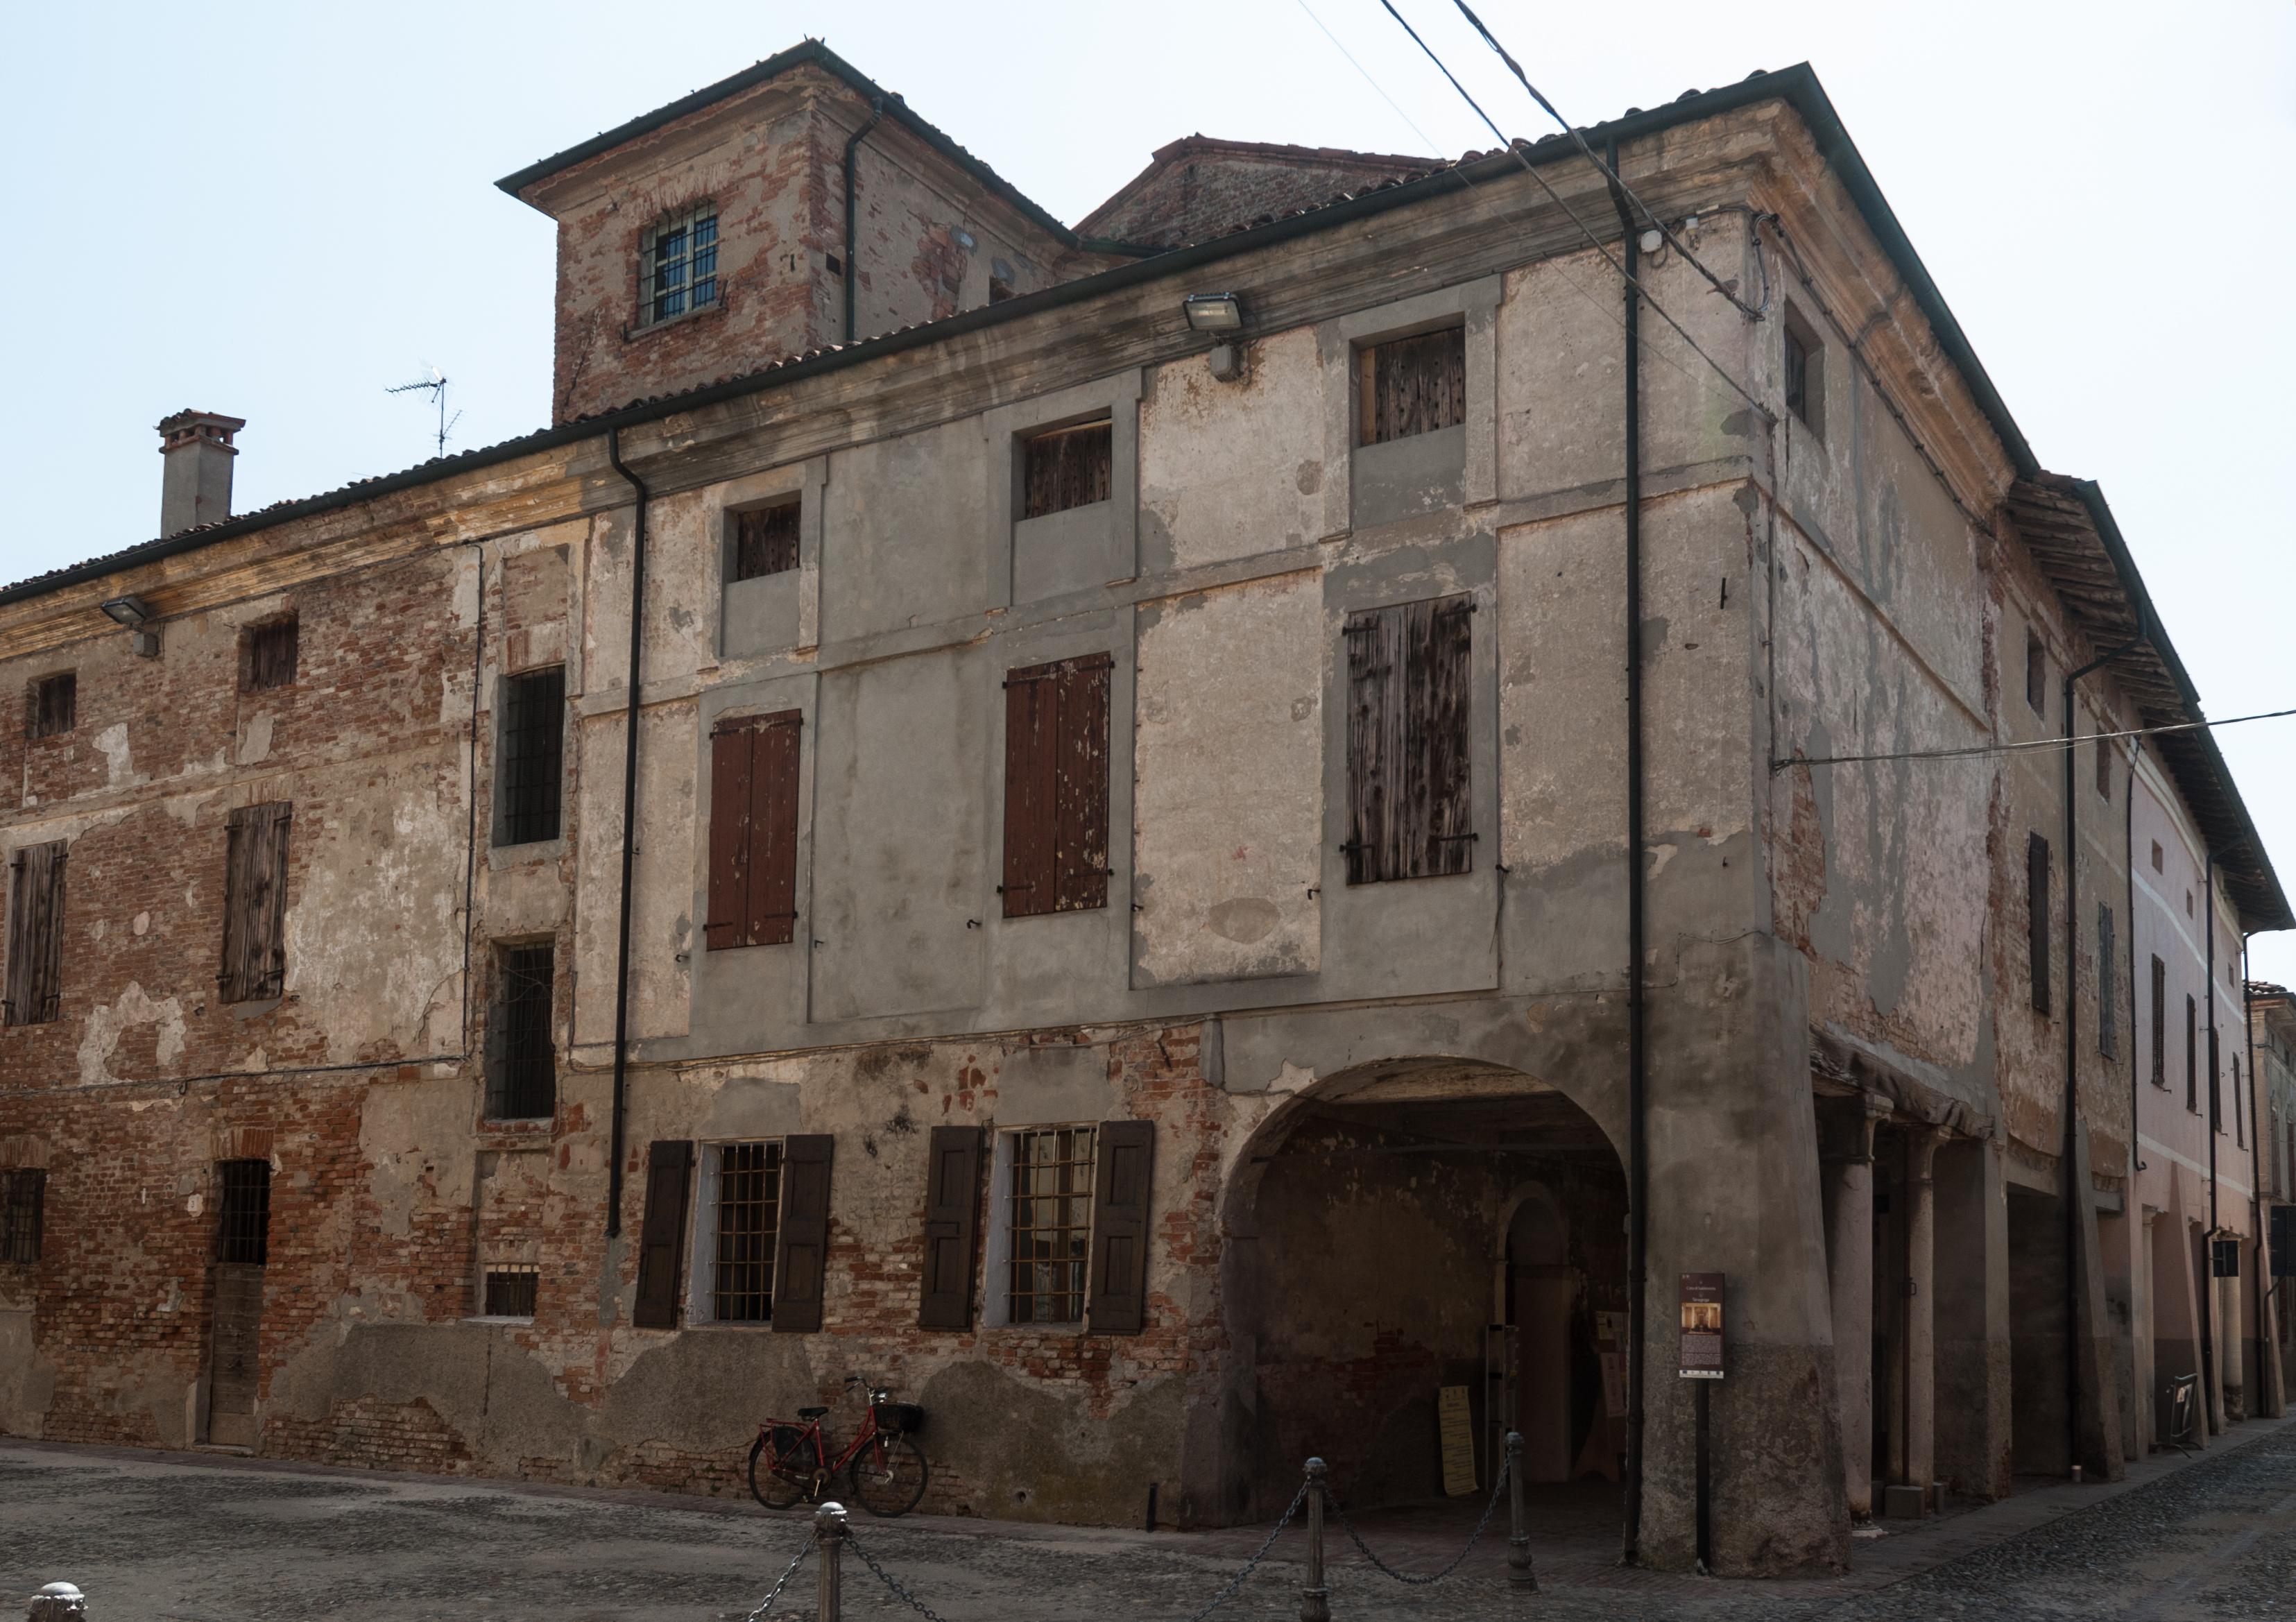 Sinagoga di Sabbioneta